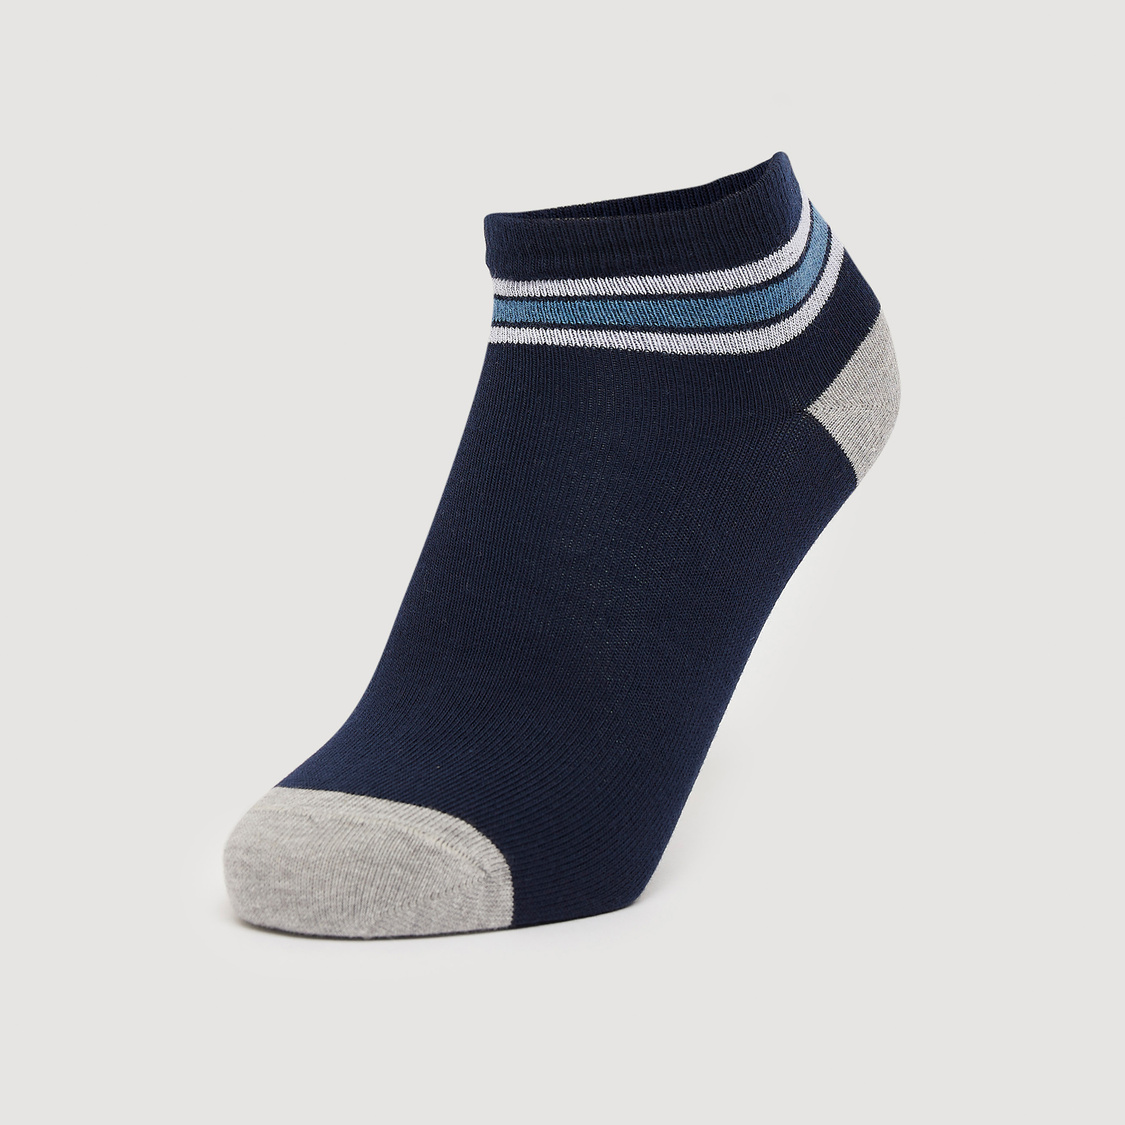 Set of 5 - Ankle Length Socks with Elasticated Hem